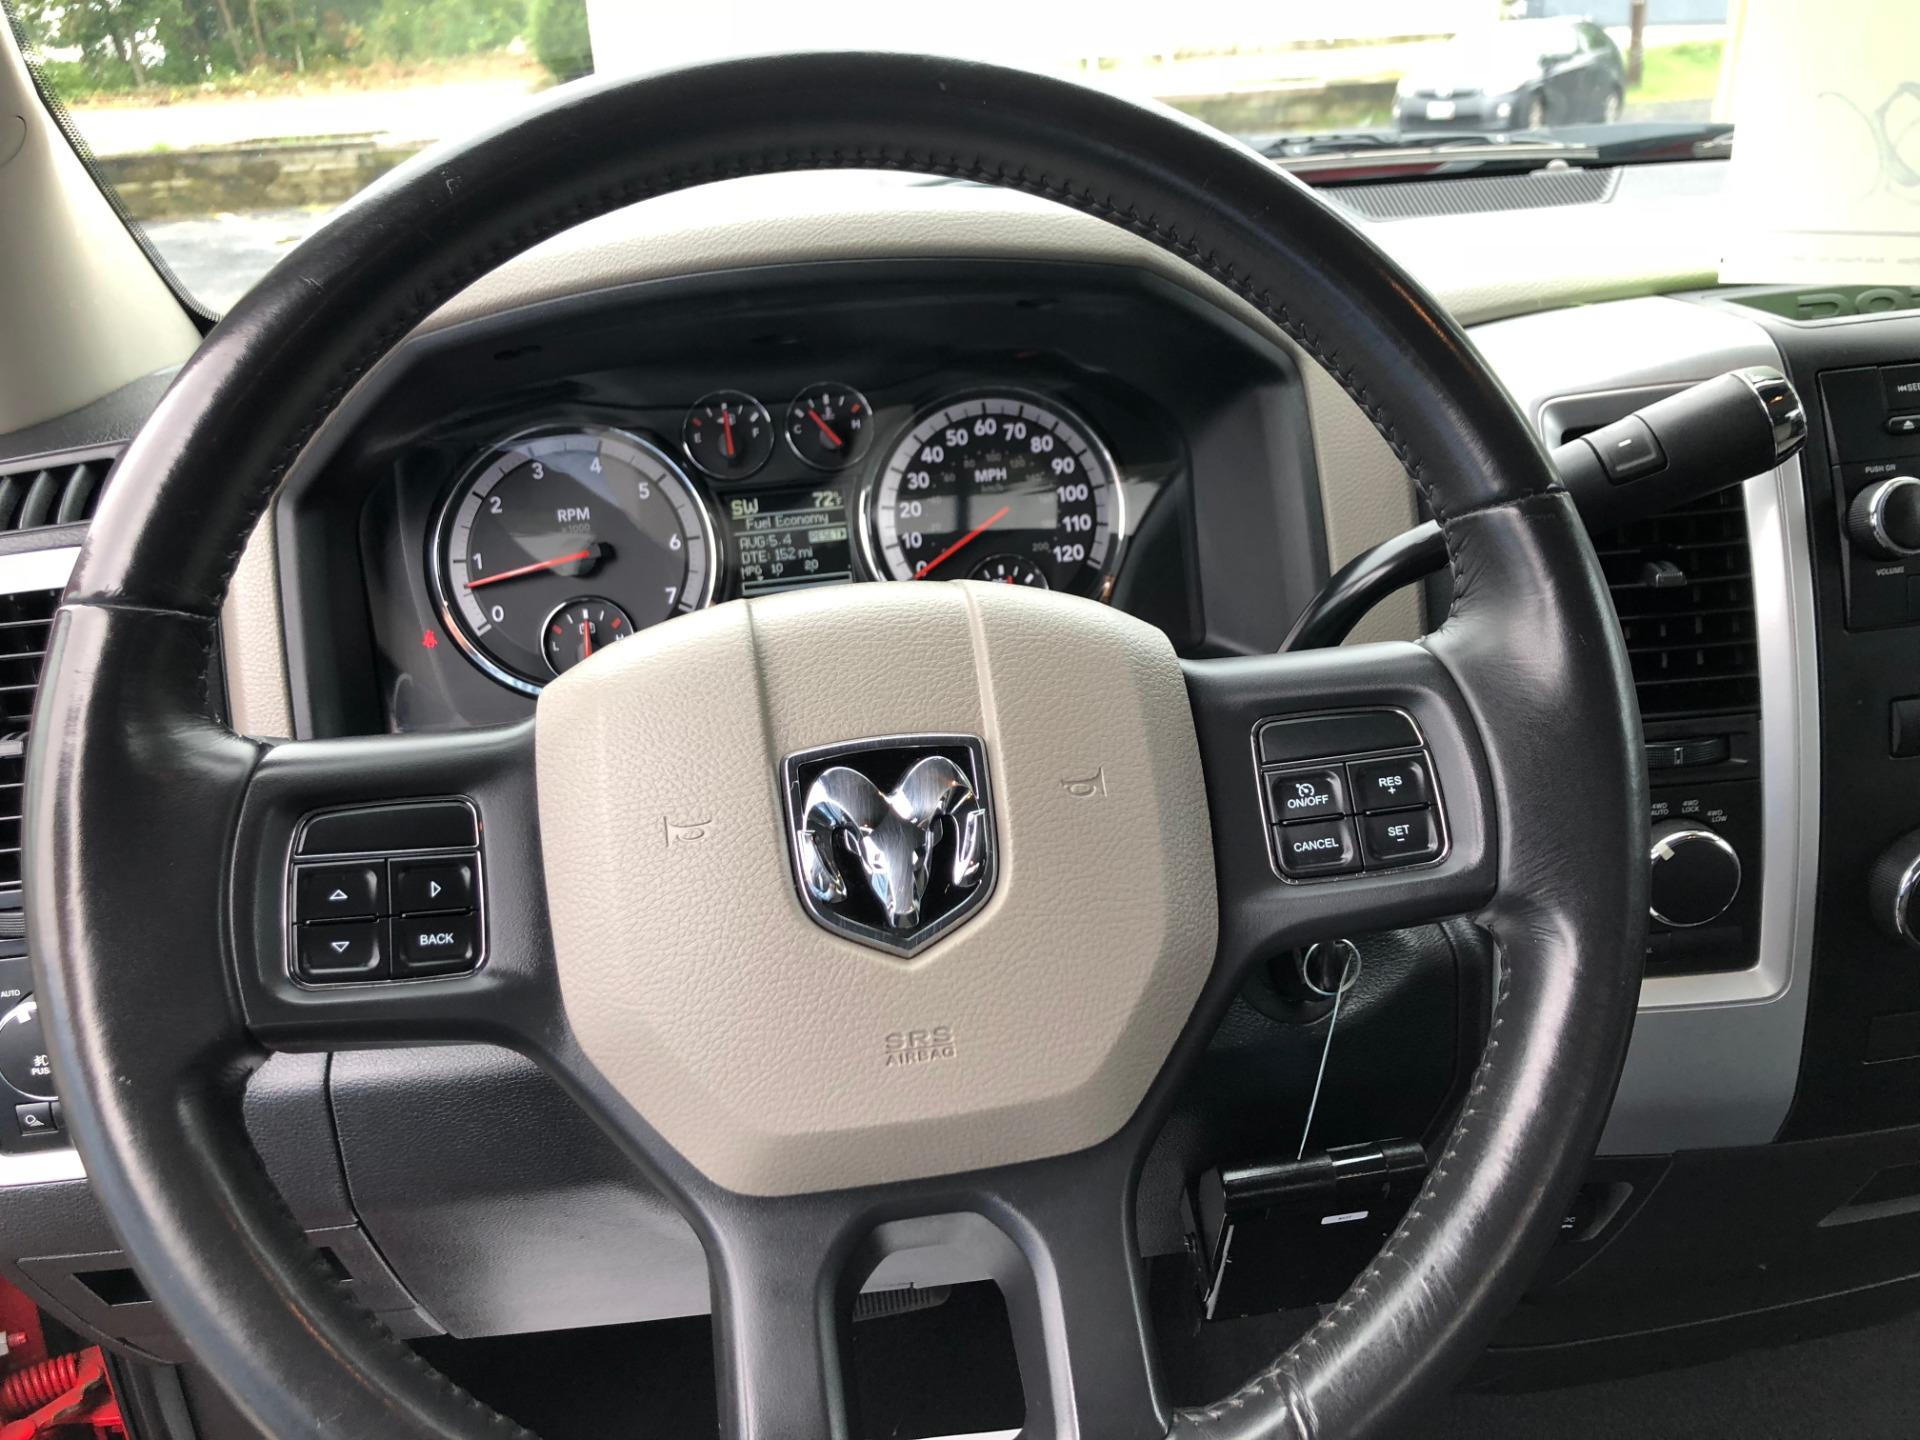 2012 Dodge Ram 1500 Slt Stock 1716 For Sale Near Smithfield 0 Dakota Custom Fit Vehicle Wiring Tow Ready Used